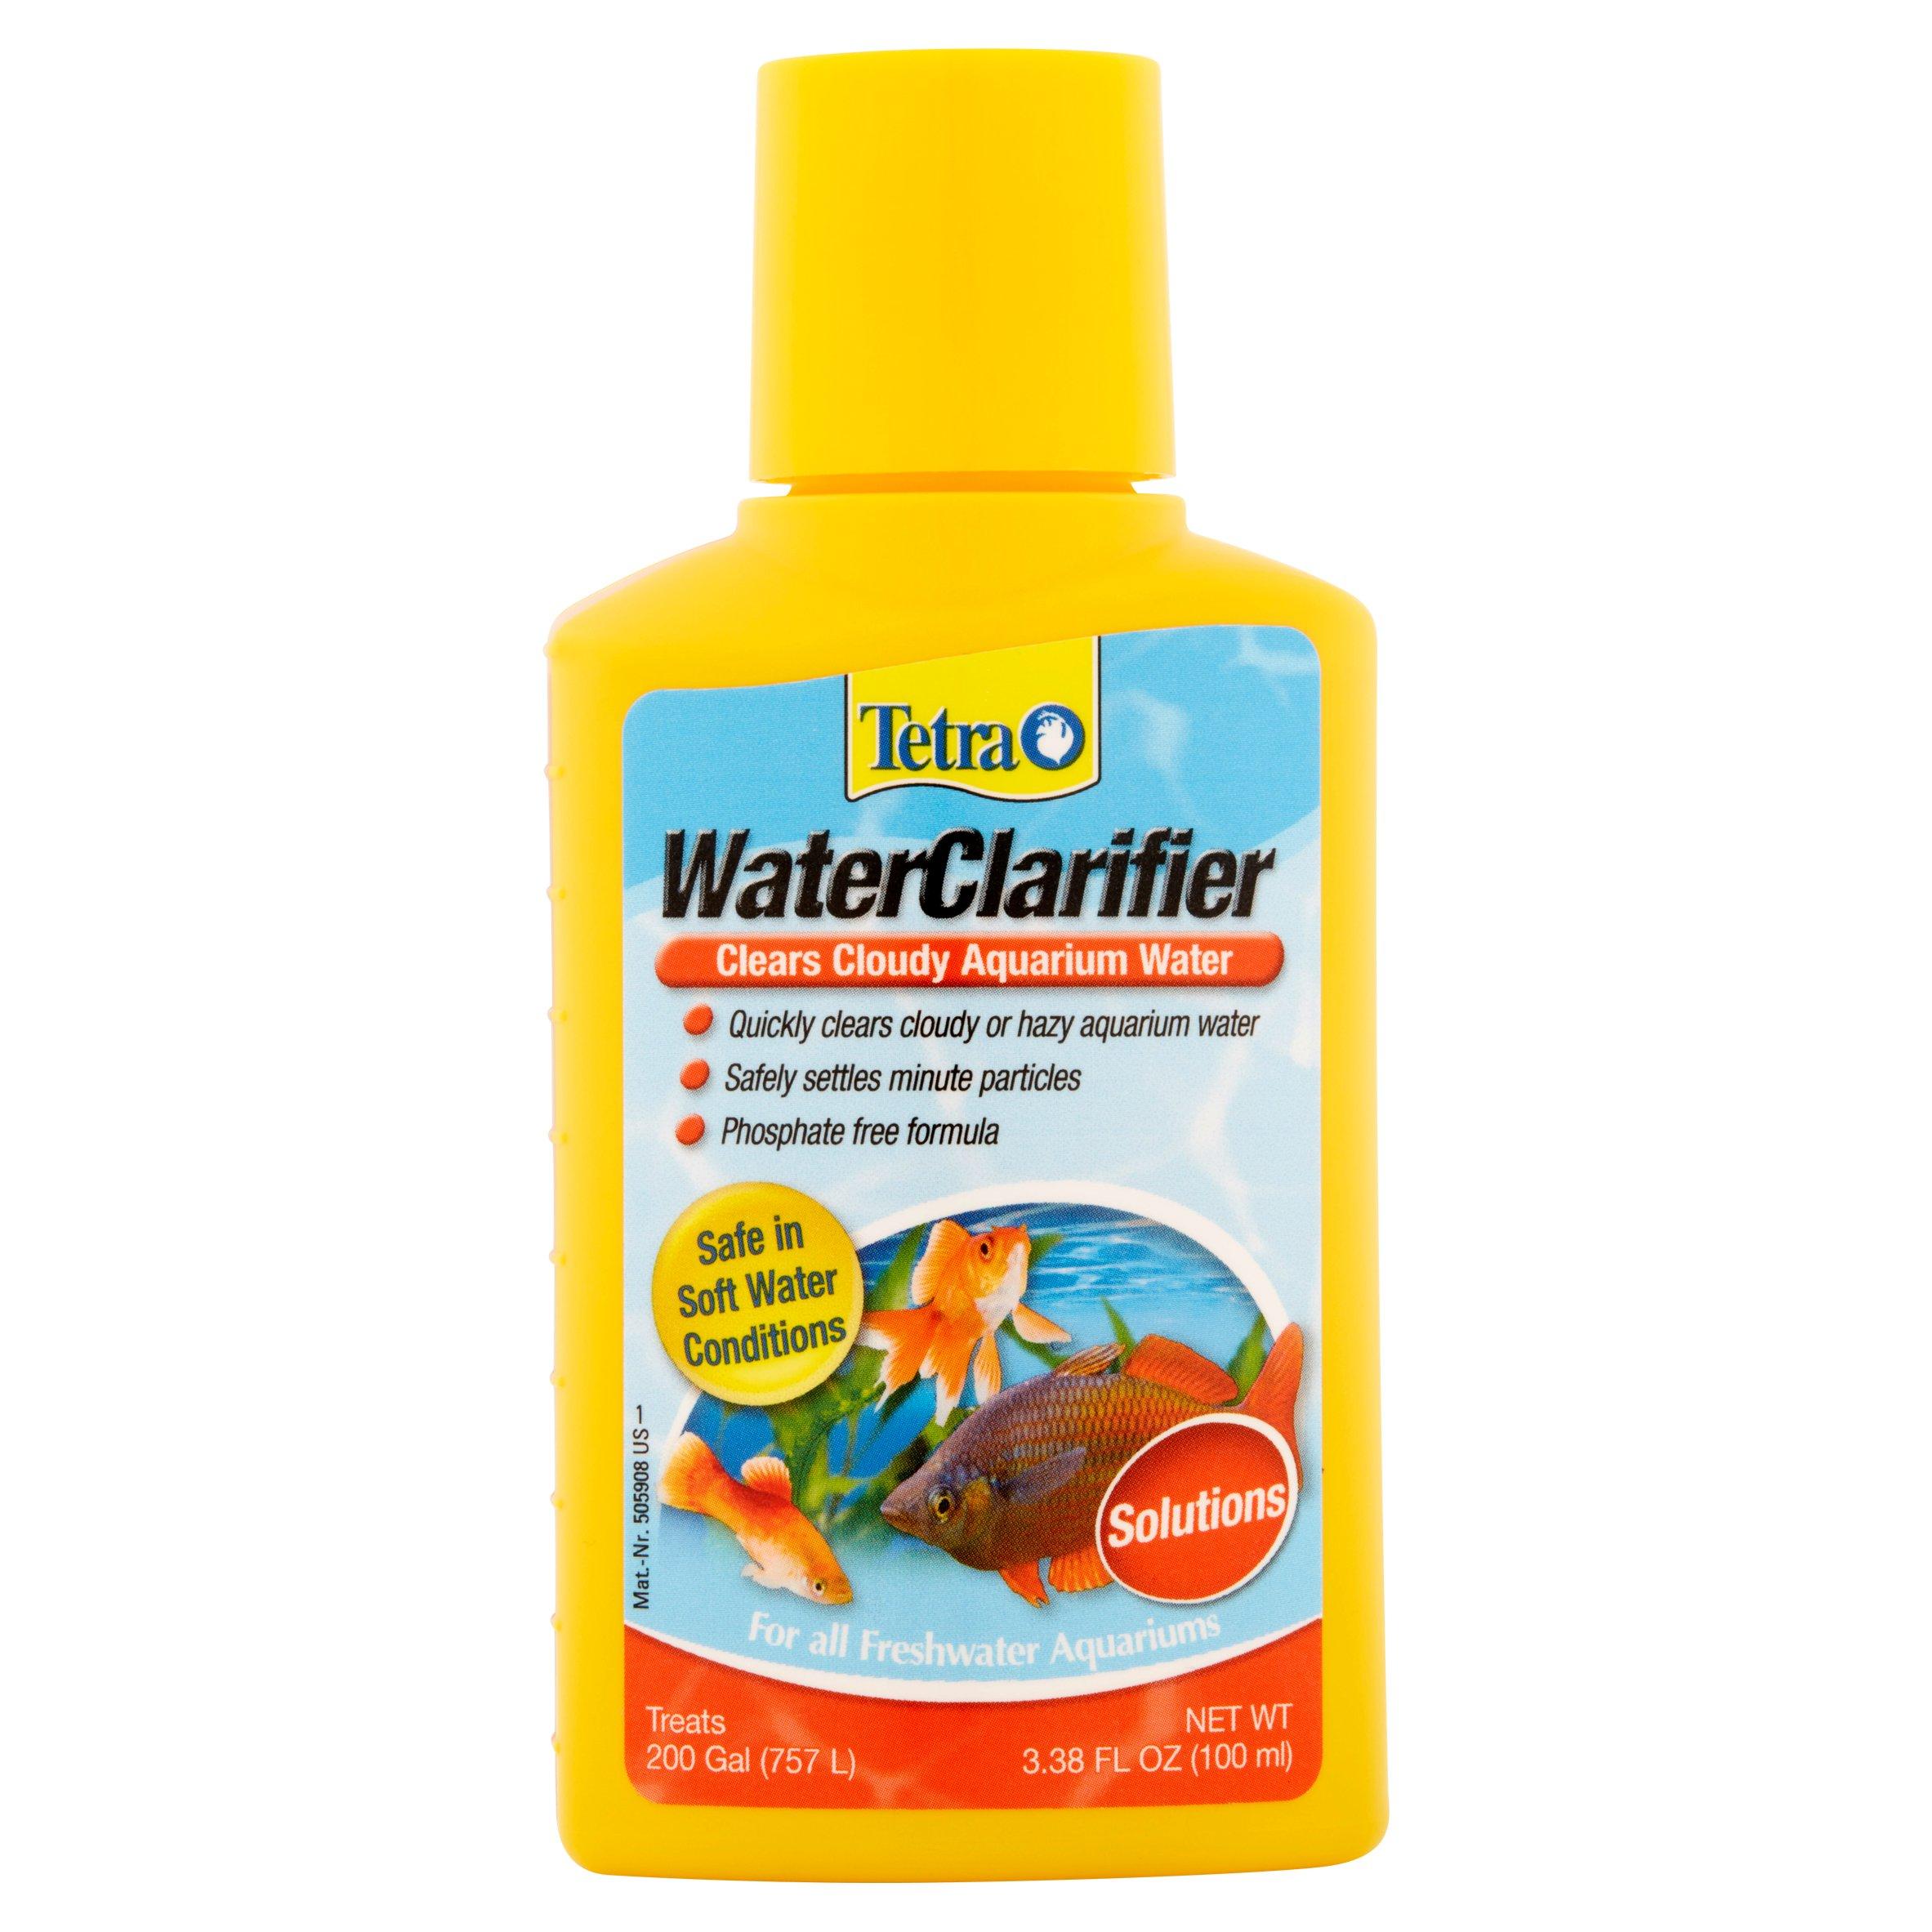 (2 Pack) Tetra Water Clarifier Aquarium Treatment Solution, 3.38 oz